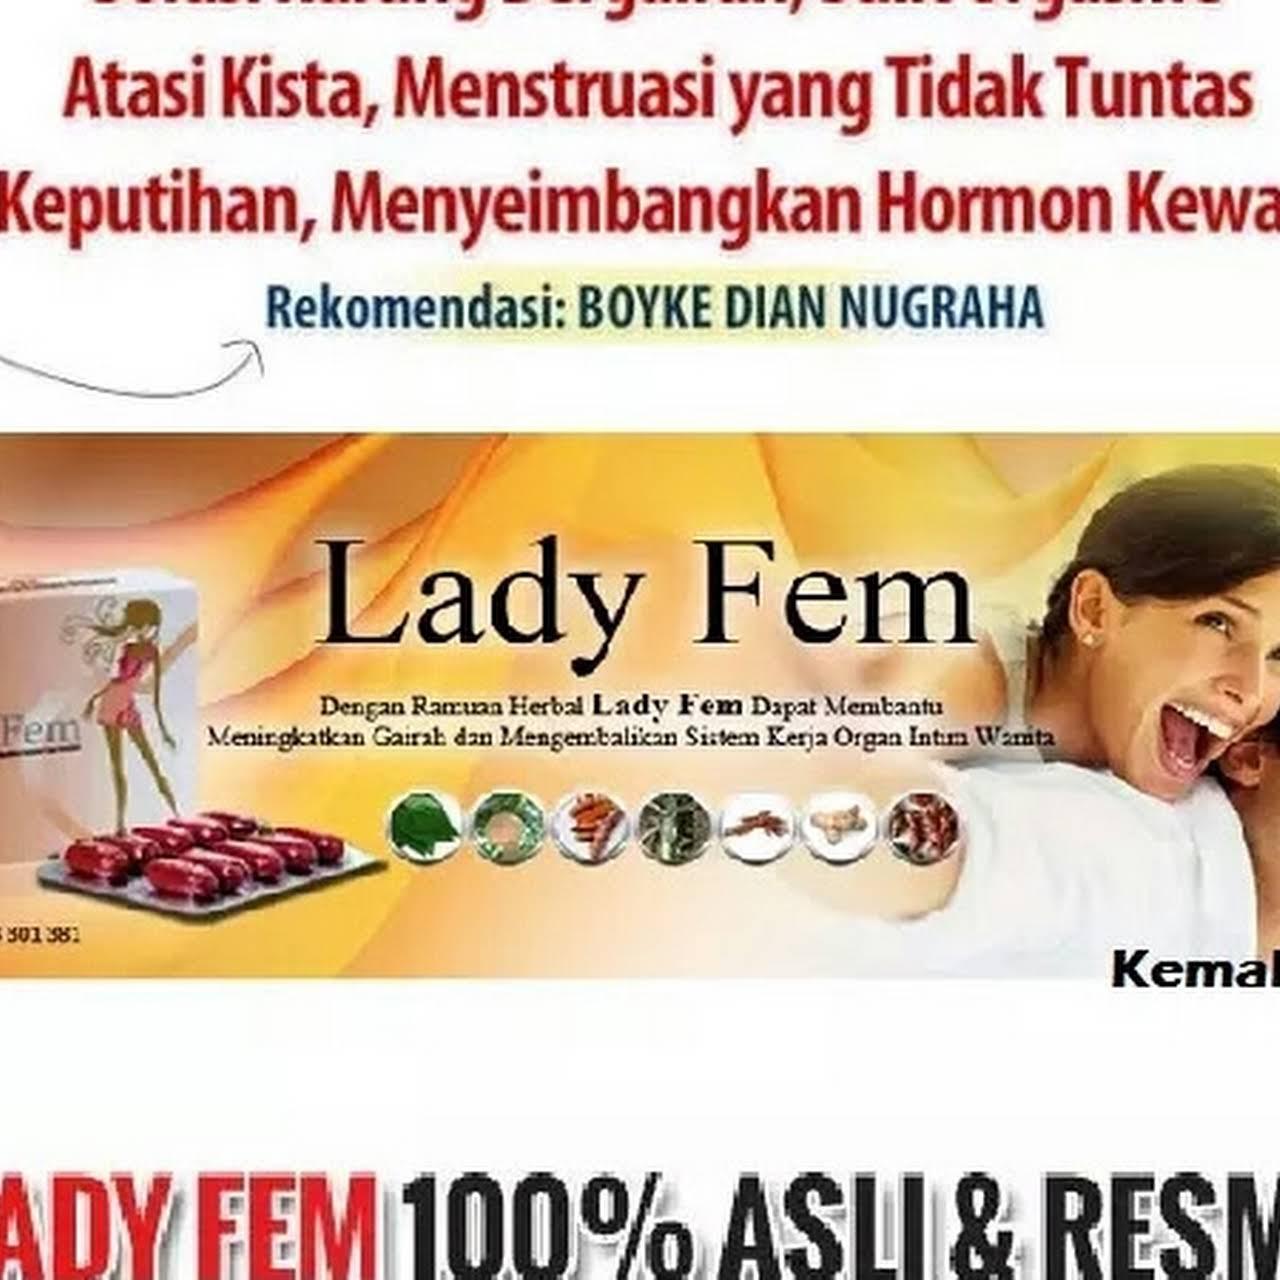 Lady Fem Solusi Gairah Wanita Kista Miom Sakit Haid Rekomendasi Obat Penambah Bluee Wizard Blue Ter Ladyfem Cocok Untuk Terapi